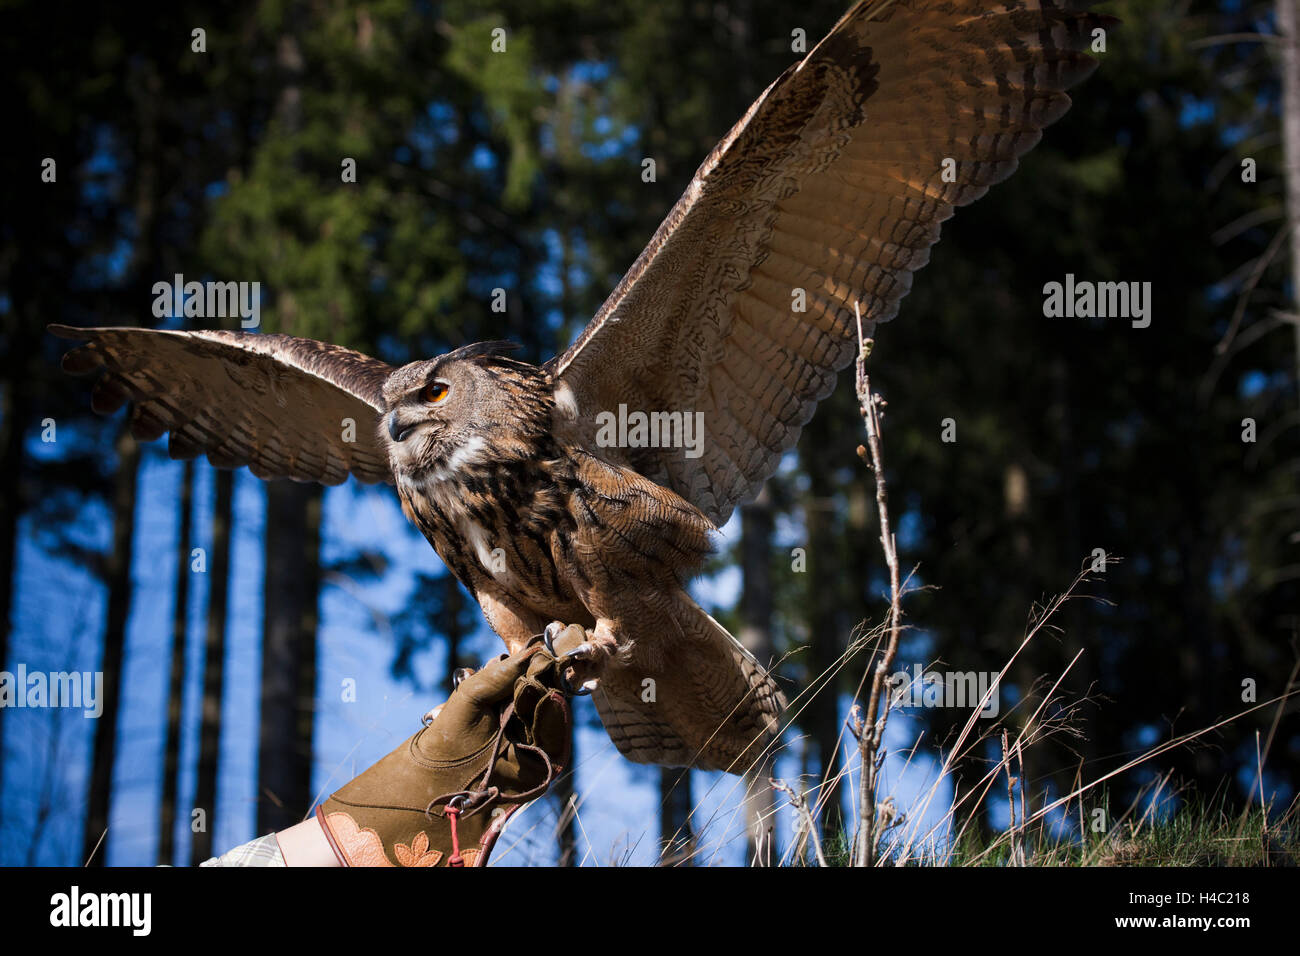 Falconer letting eagle owl fly - Stock Image